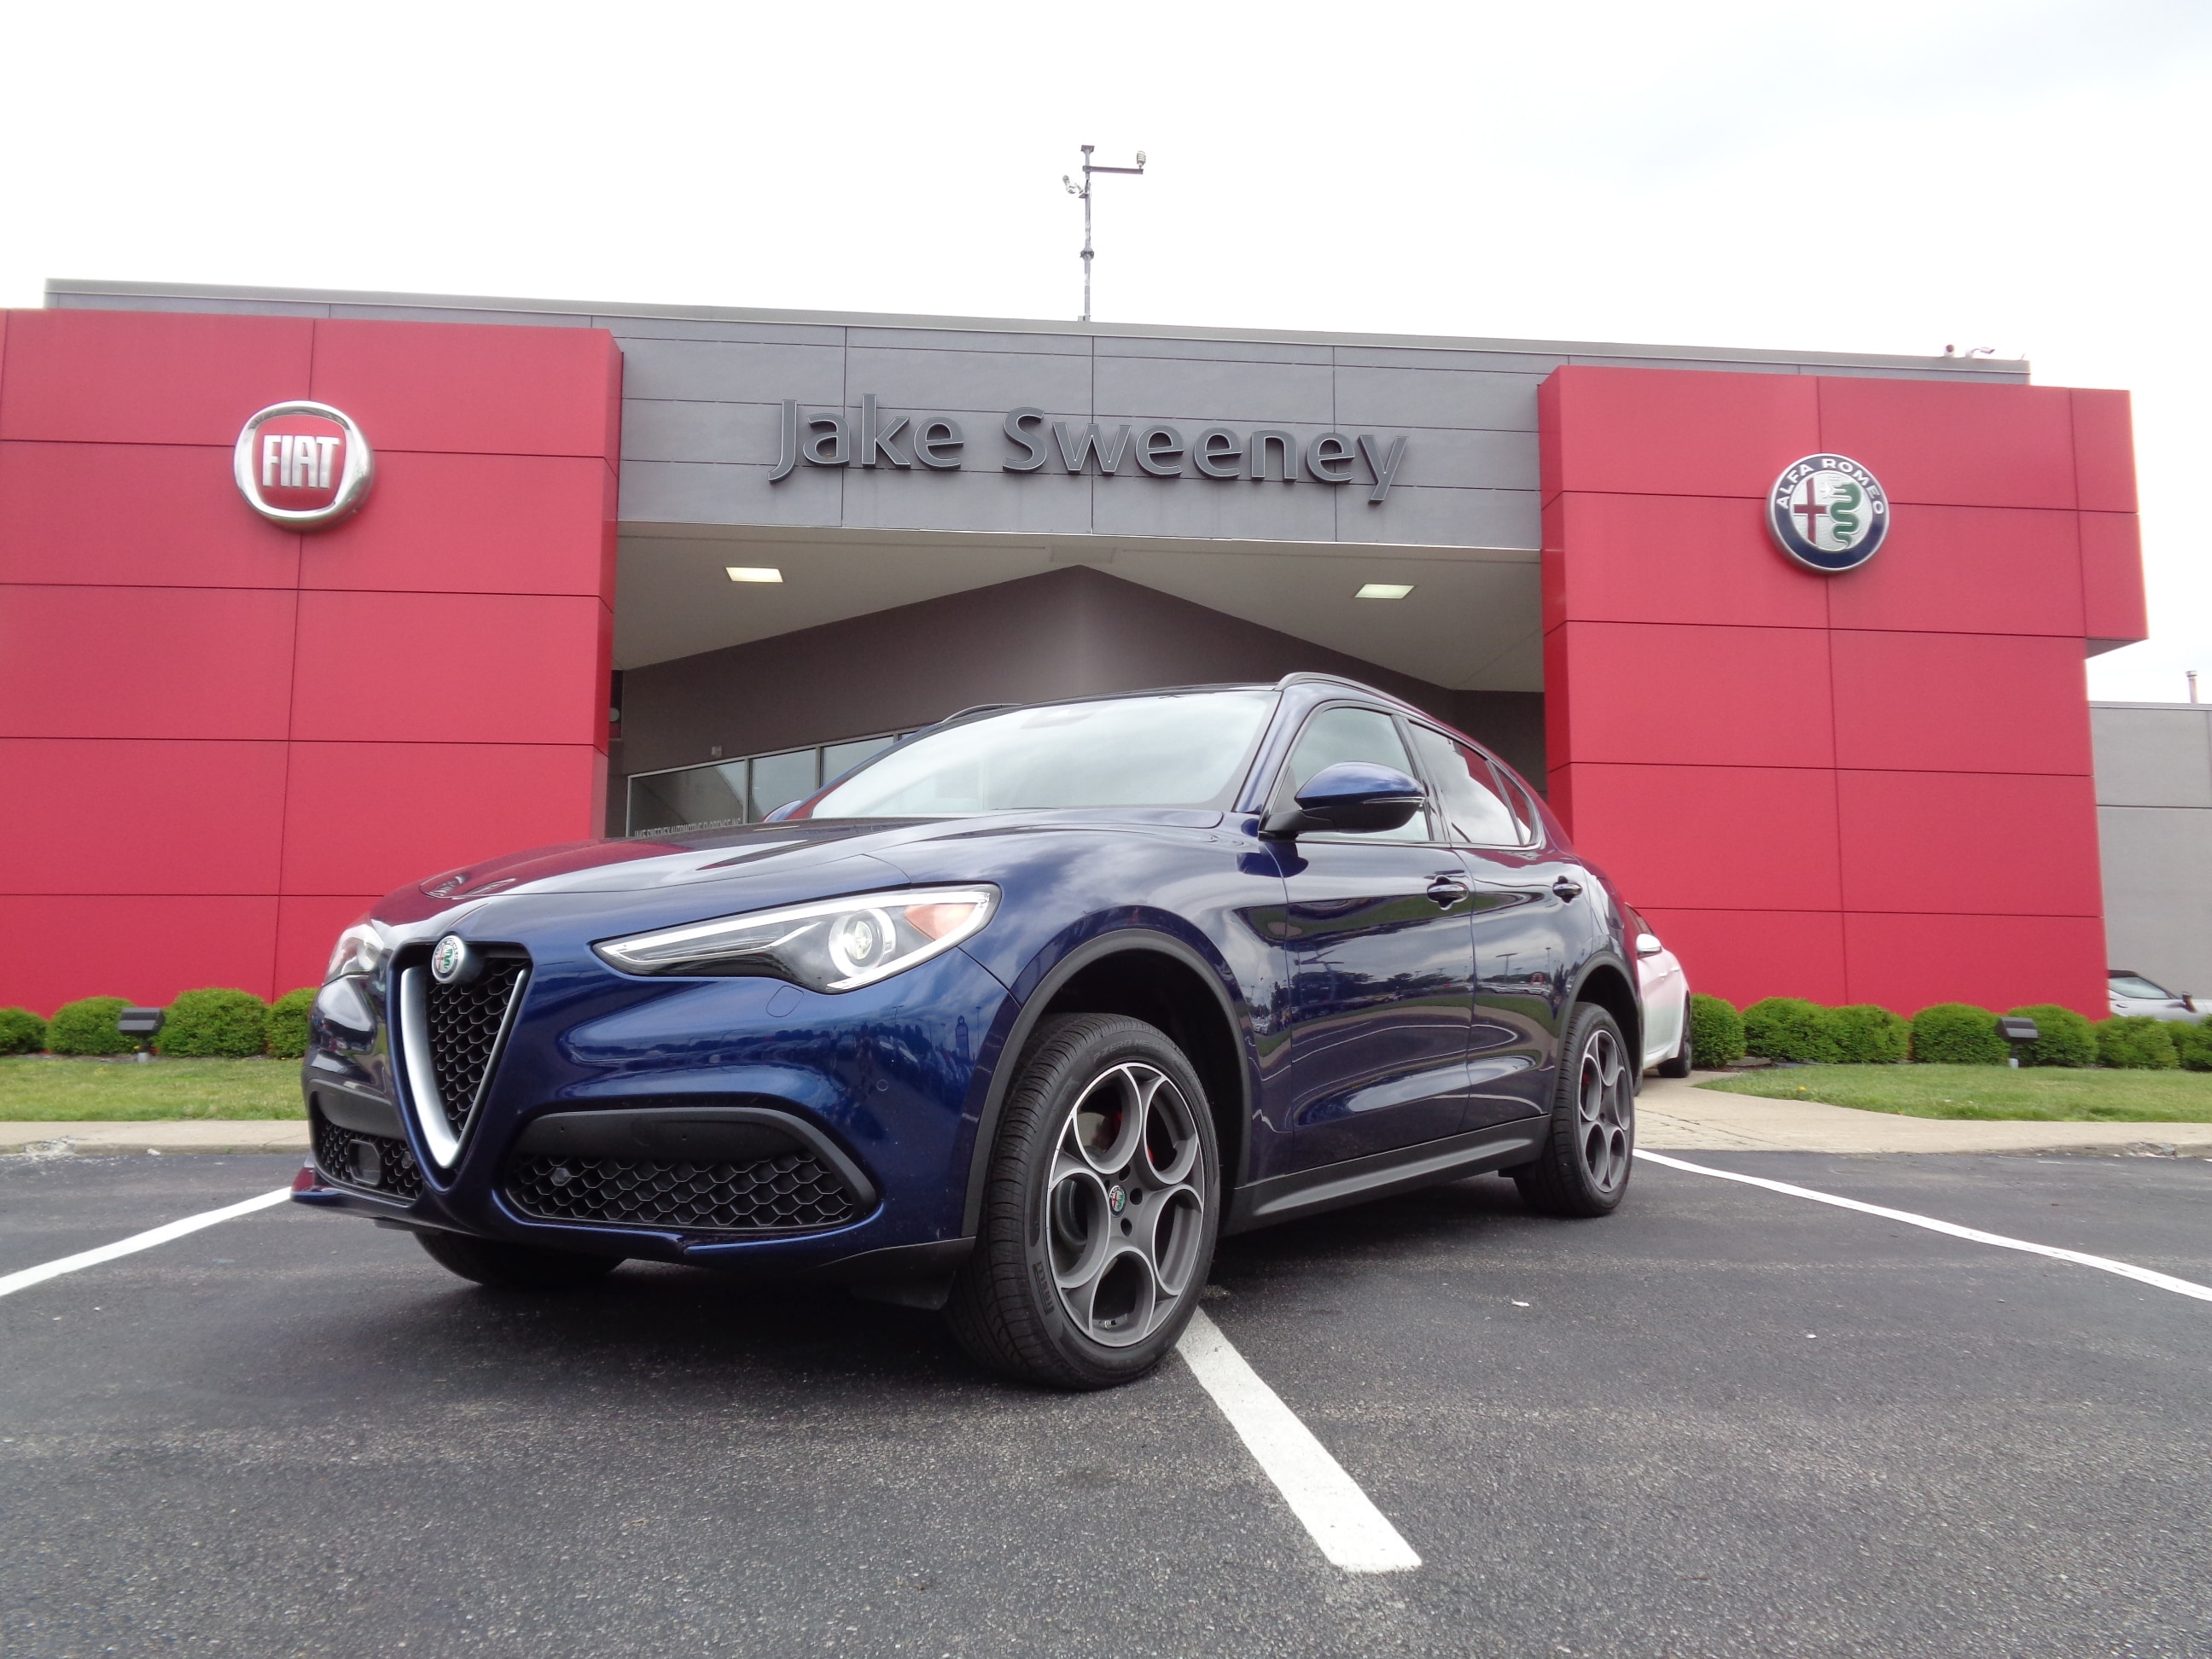 Jake Sweeney Alfa Romeo | Florence, KY Alfa Romeo Dealership